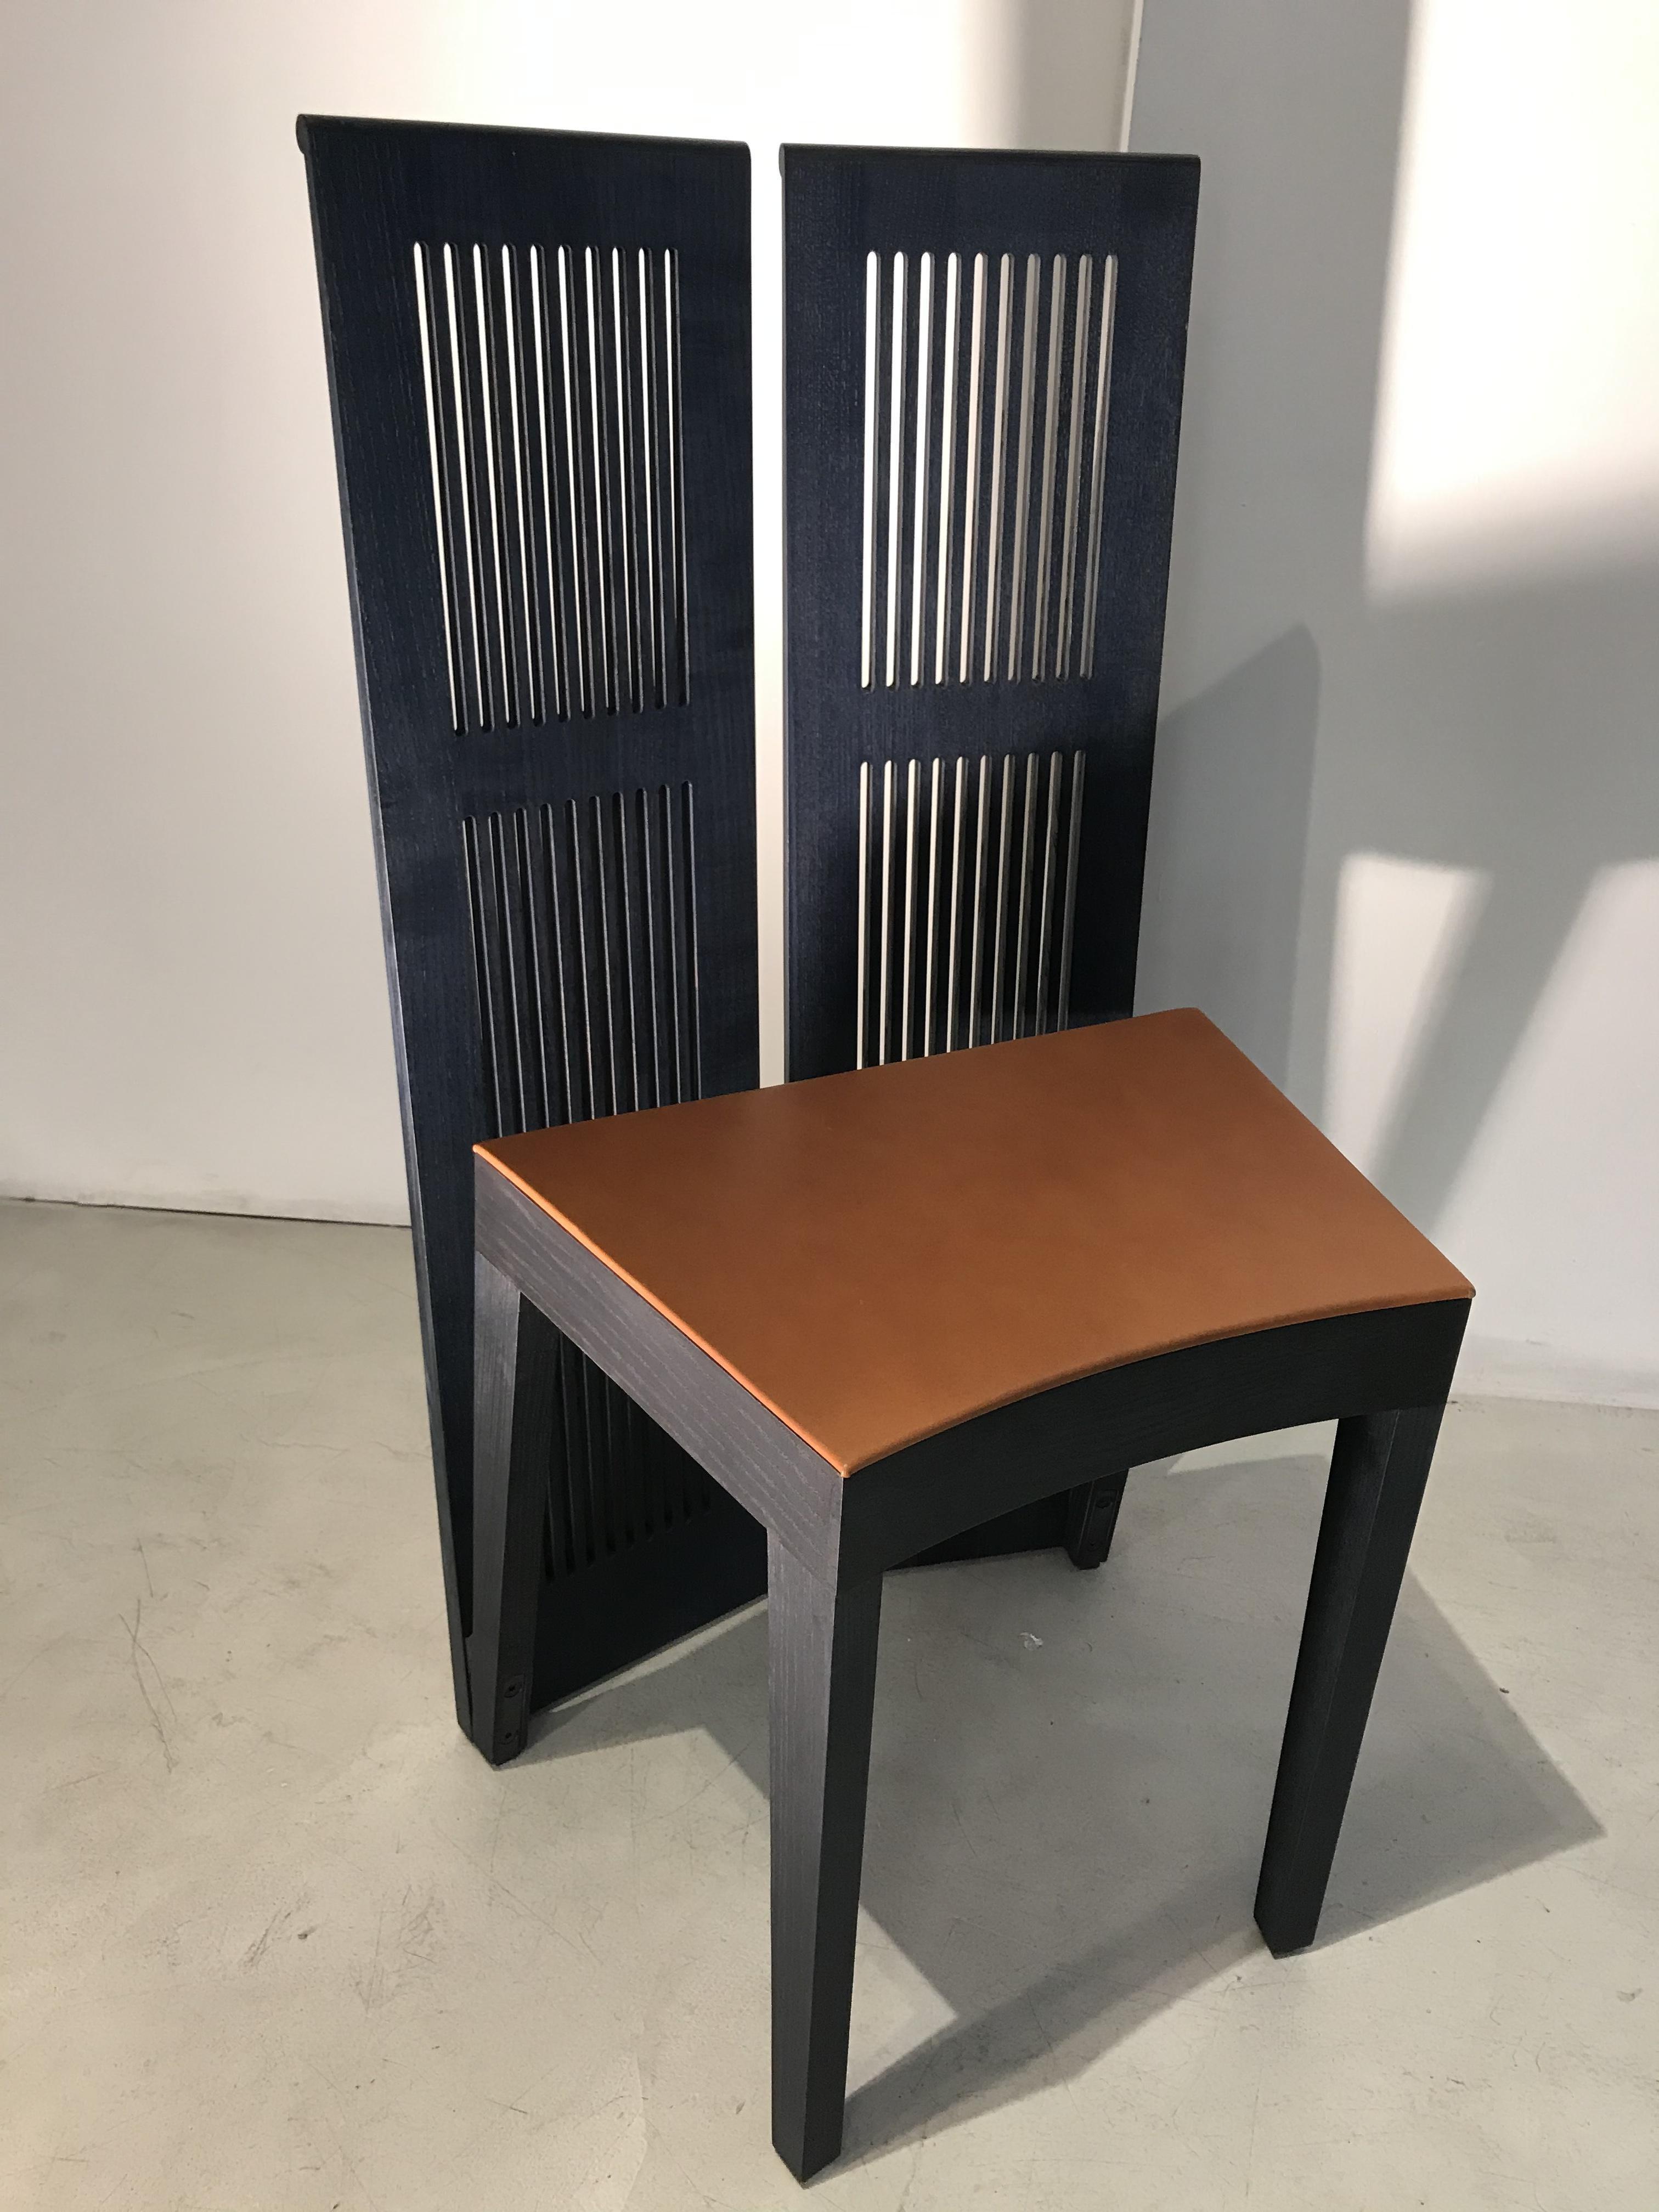 LUBEKKA chair design Andrea Branzi original Cassina Made in Italy